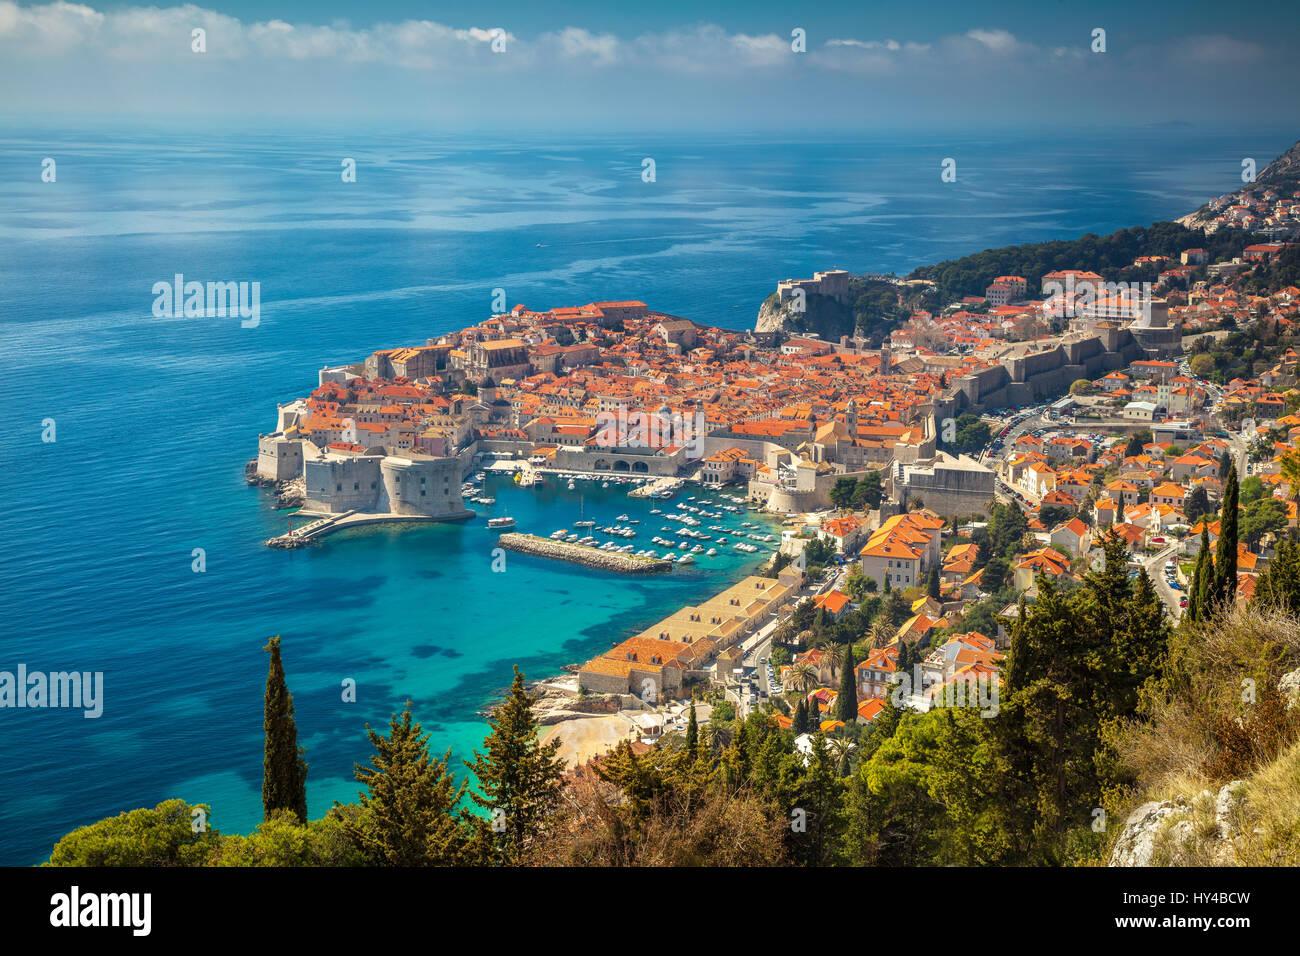 Dubrovnik, Kroatien. Schöne romantische Altstadt von Dubrovnik an sonnigen Tag, Kroatien, Europa. Stockbild